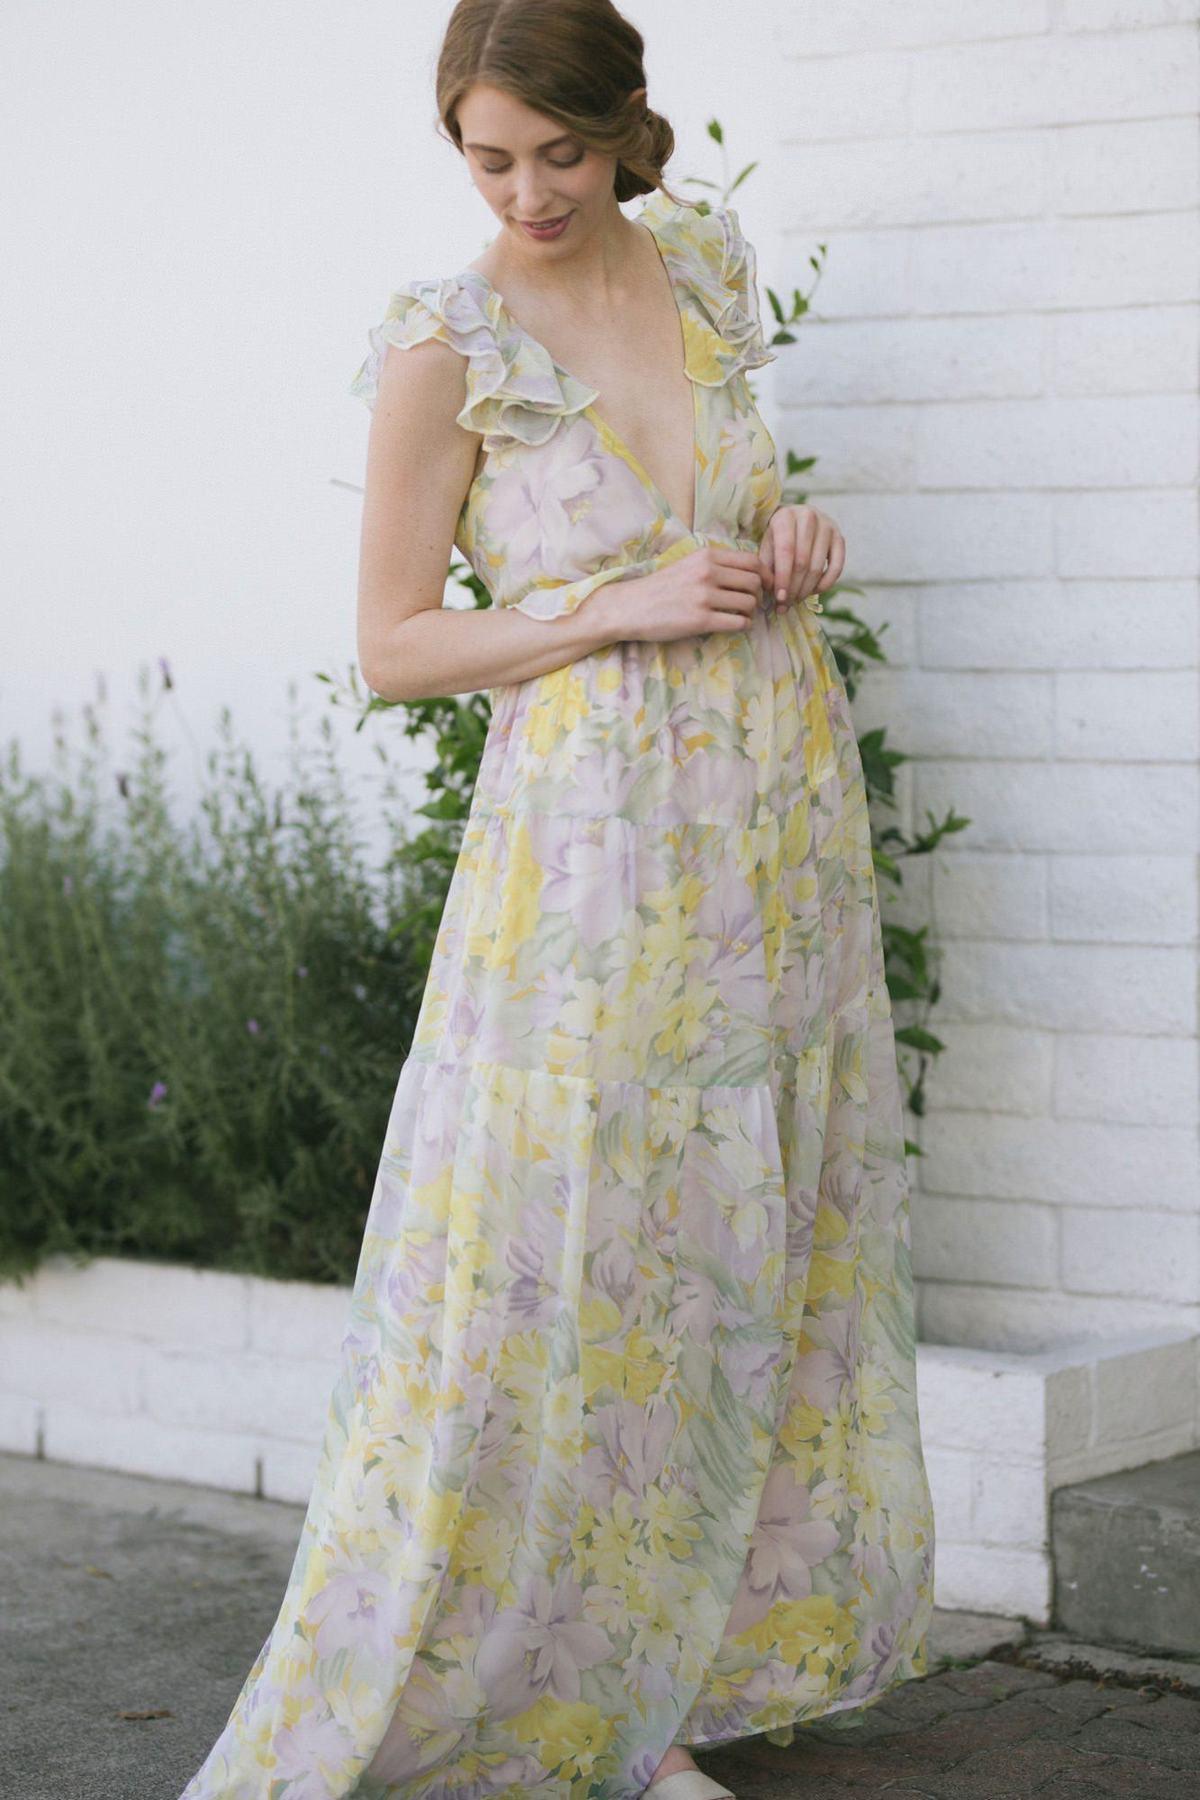 Ruffled maxi v-neck nursing dress for wedding guests